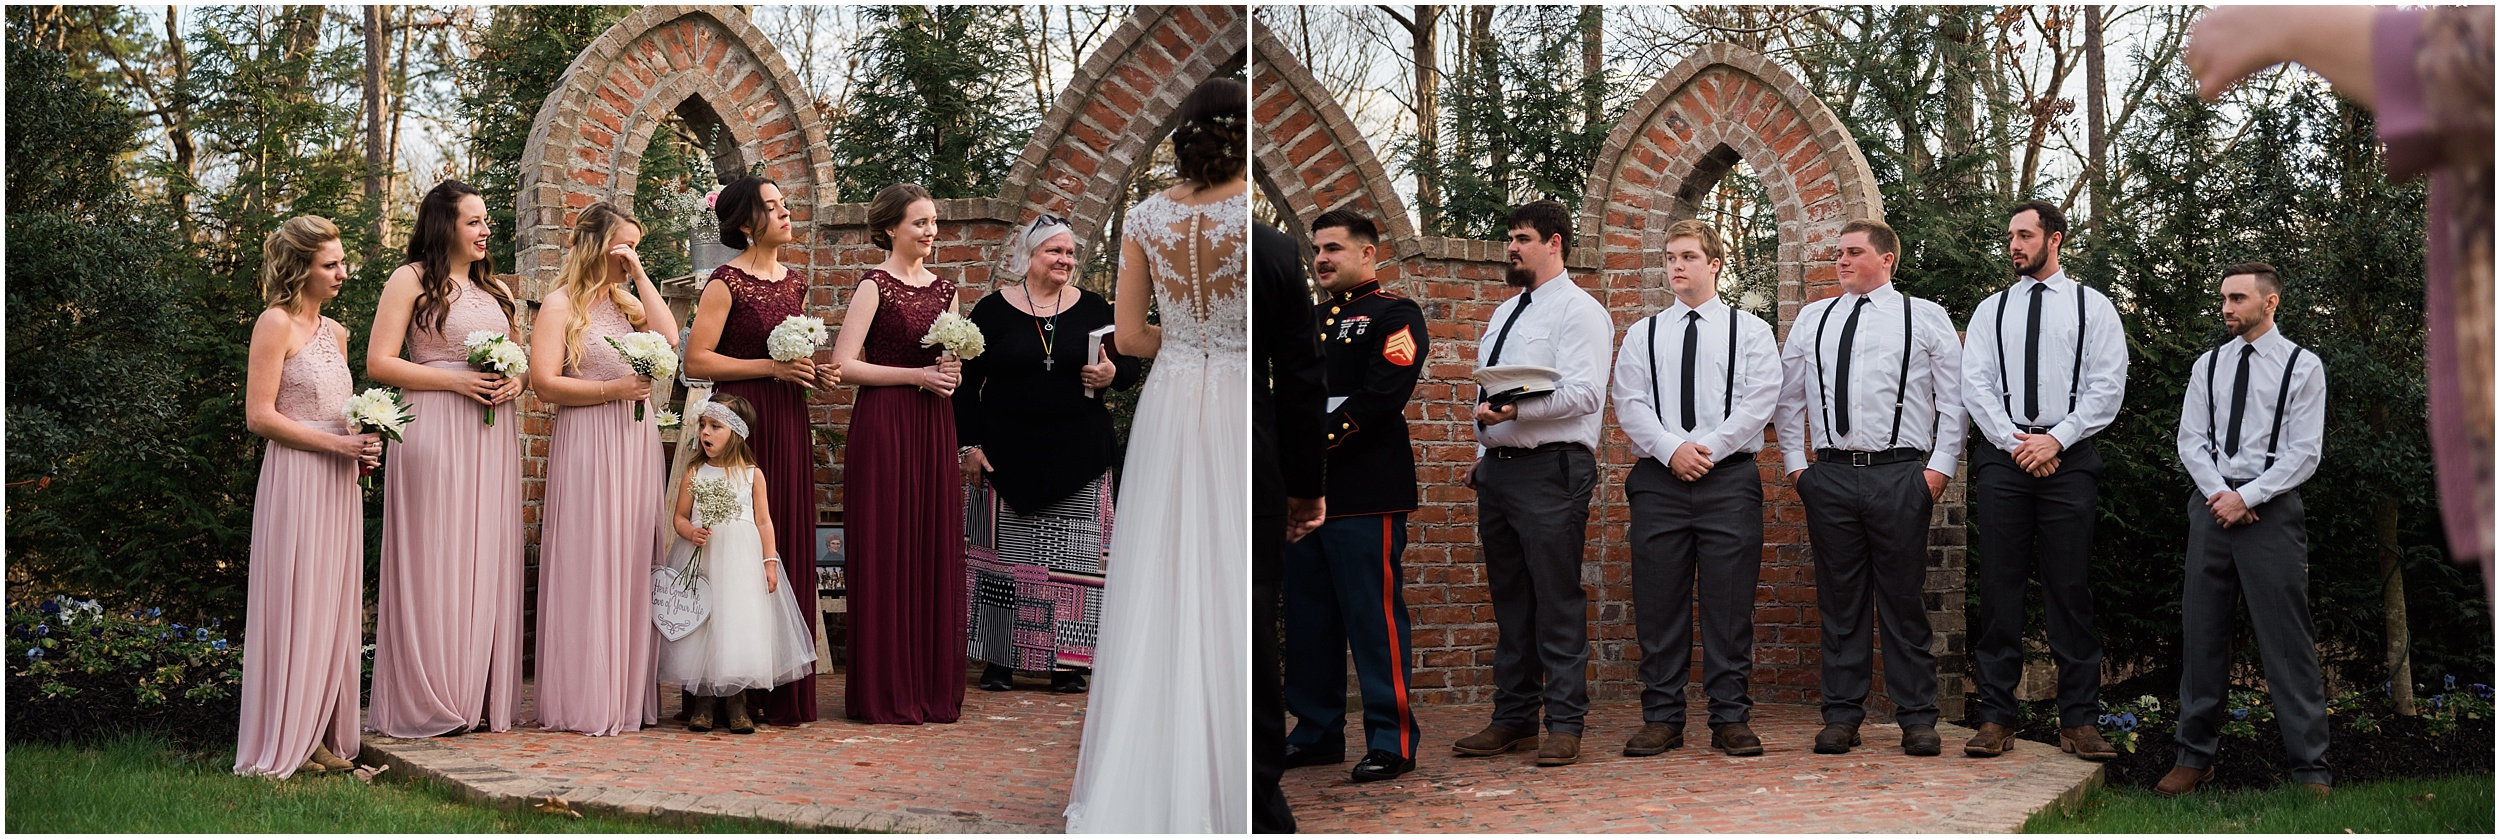 Ariel & Josh Southern Wedding in Monroe, North Carolina_0059.jpg